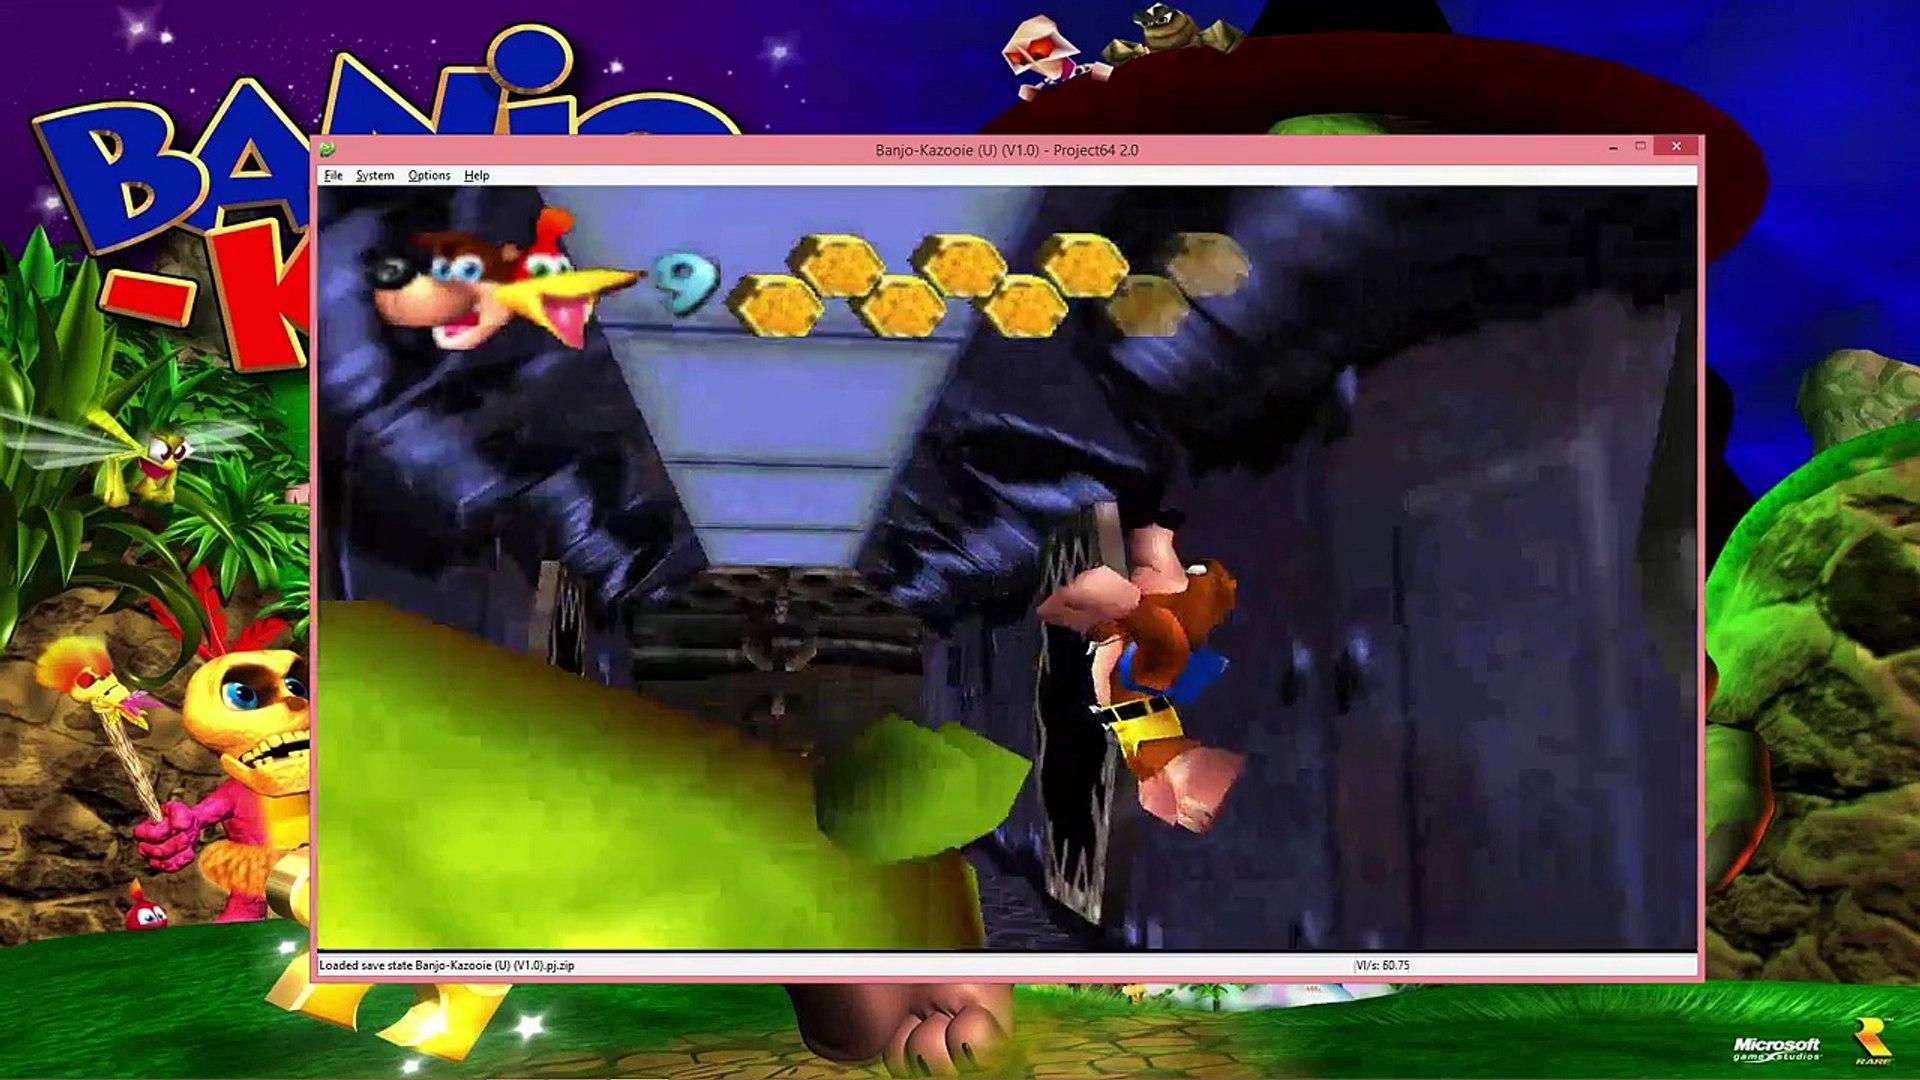 RDT Plays Banjo-Kazooie Part 40: Shark Savin' Bear